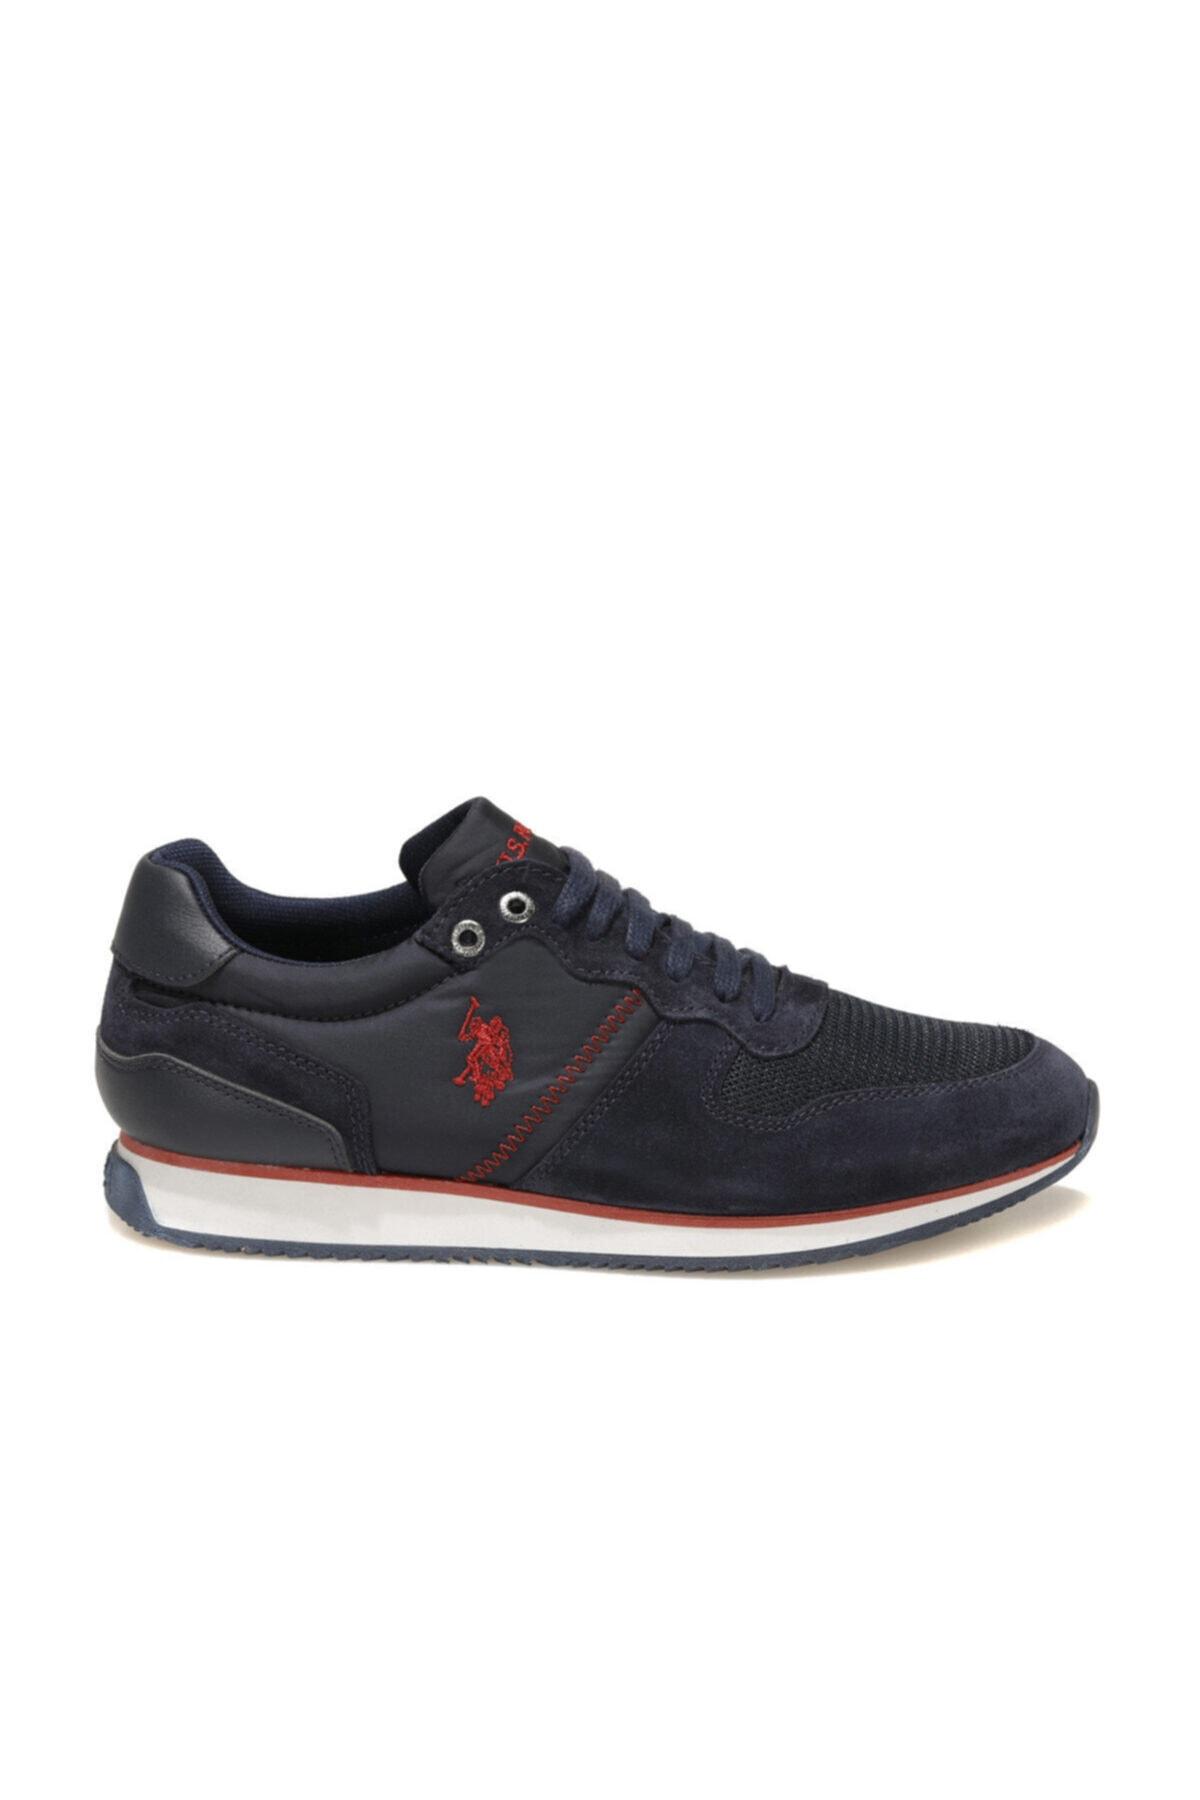 U.S. Polo Assn. MAC 1FX Lacivert Erkek Spor Ayakkabı 100910523 2